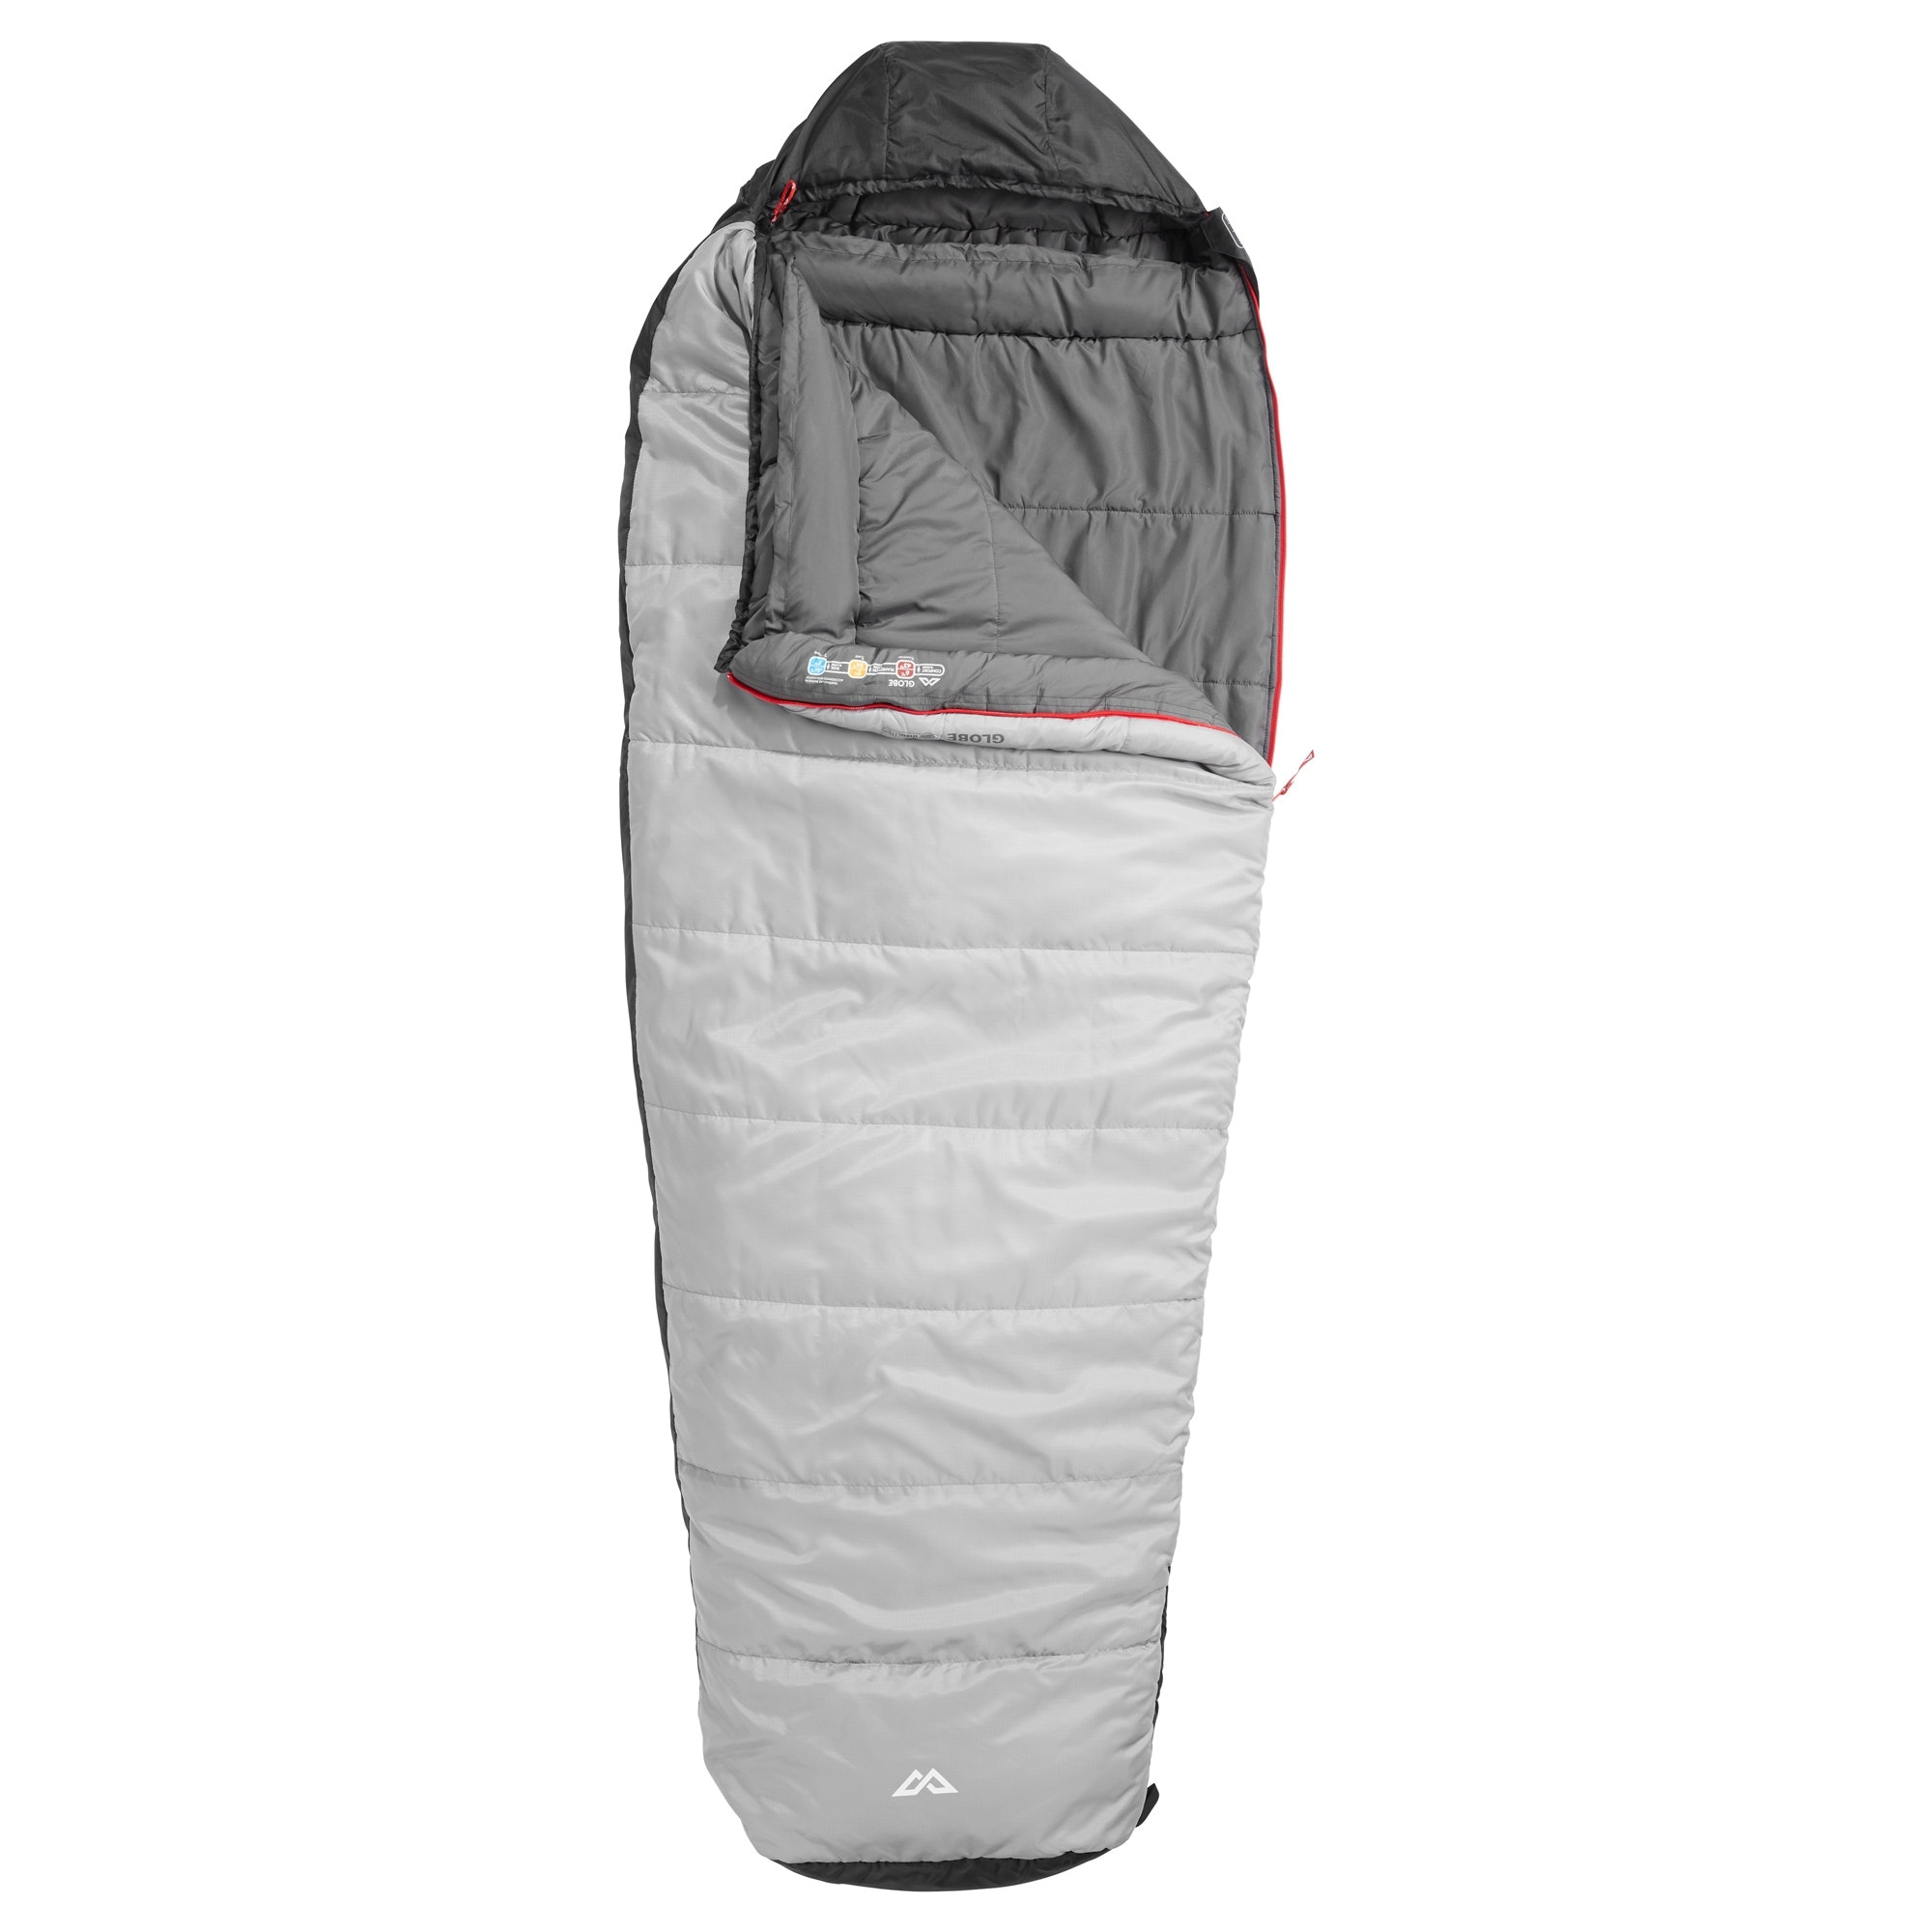 Globe Semi-Rectangular Sleeping Bag